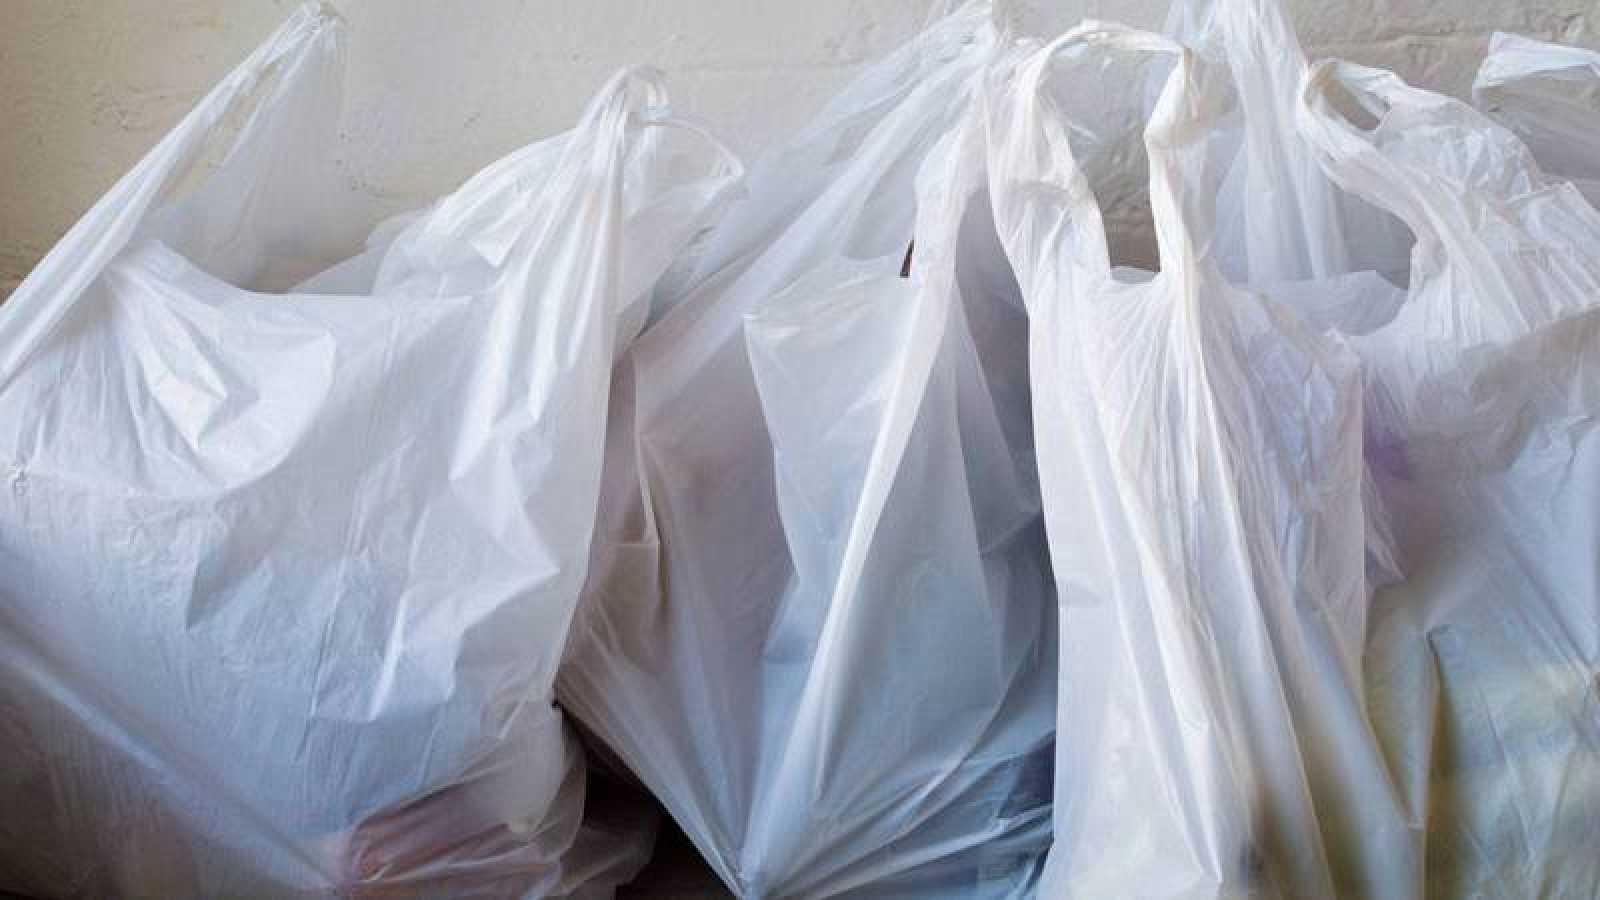 Bolsas de plástico de un solo uso o no biodegradables.